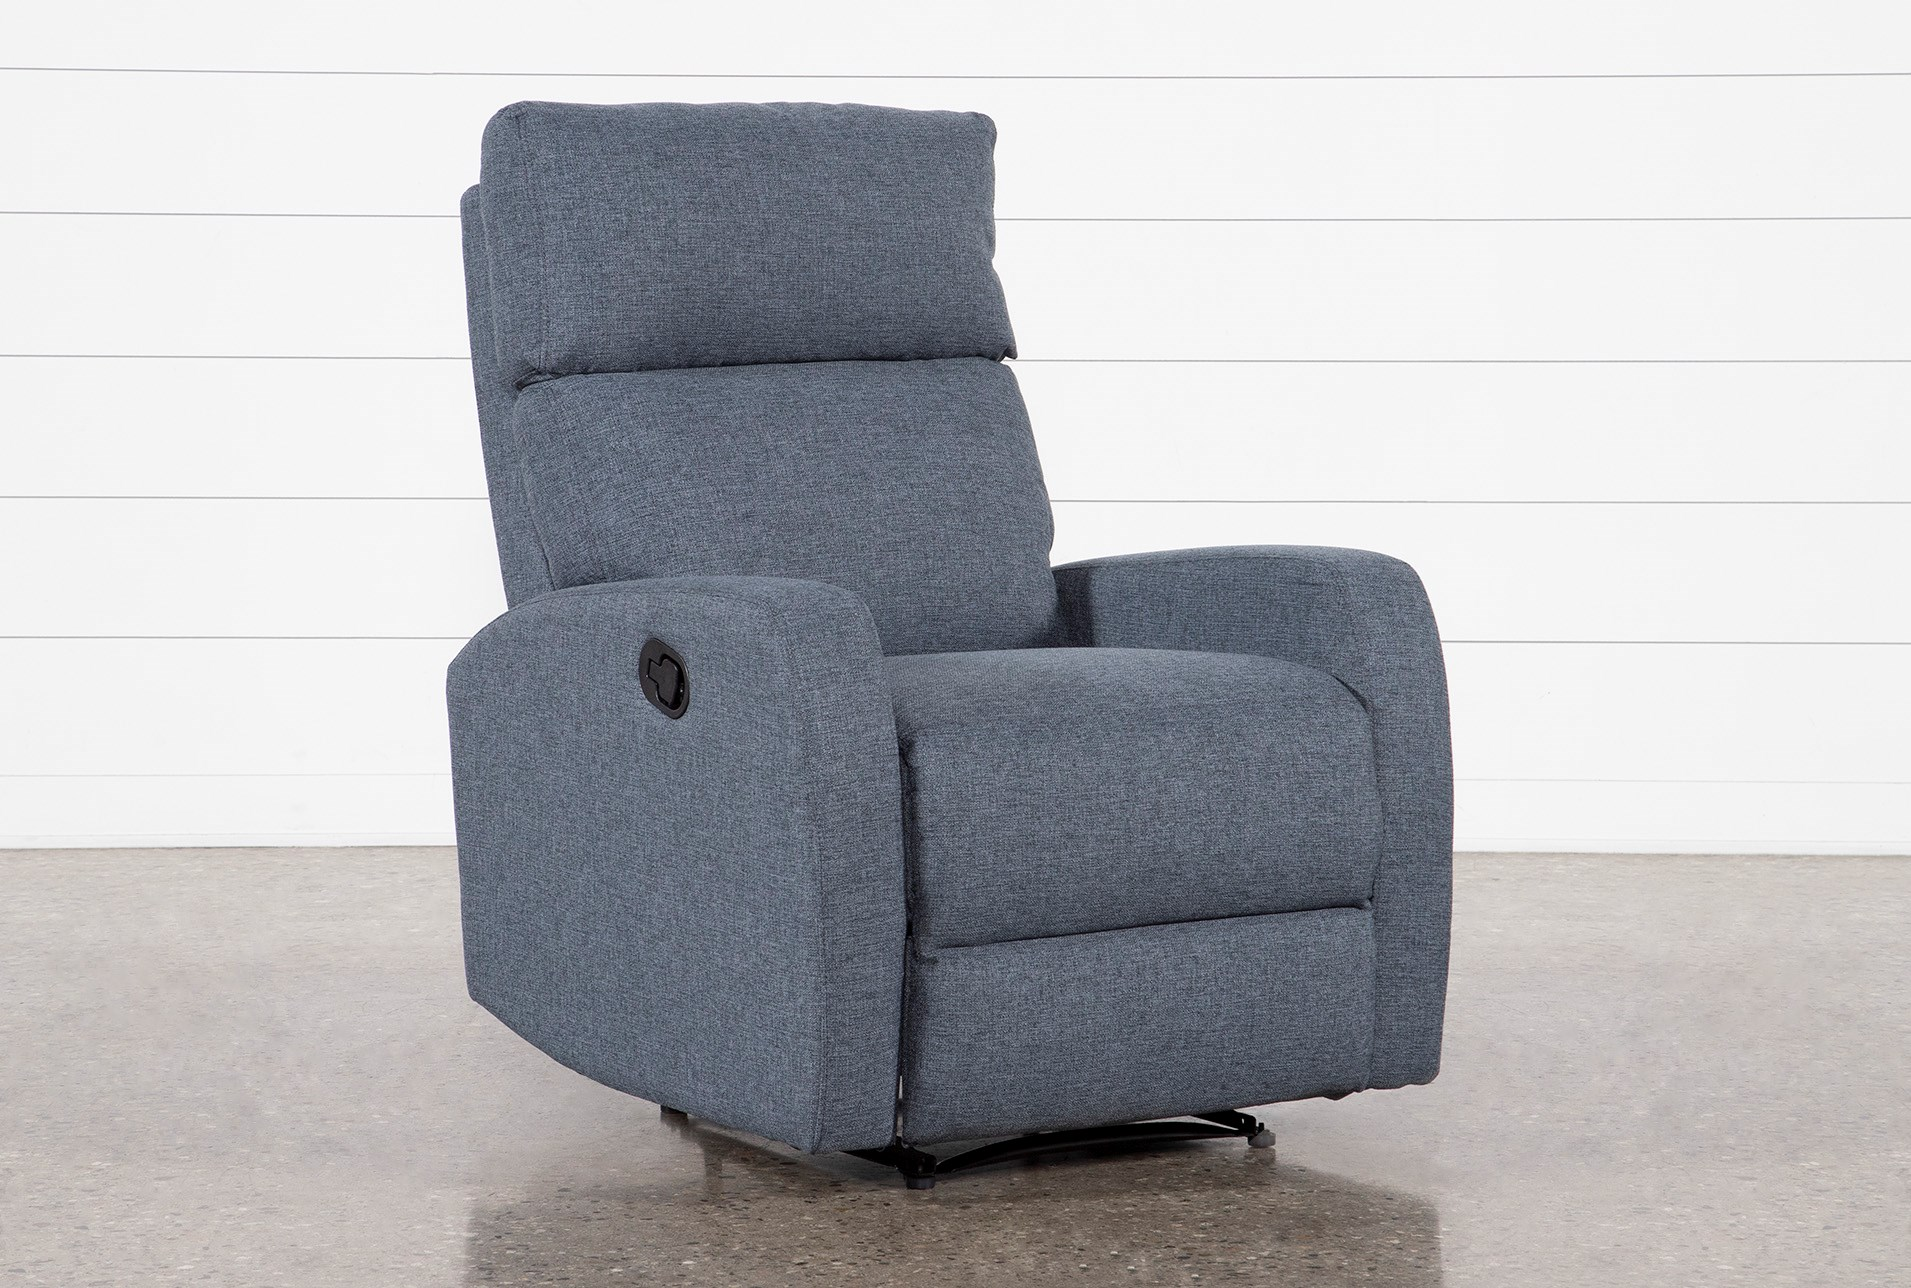 Astonishing Keaton Dark Grey Recliner Machost Co Dining Chair Design Ideas Machostcouk